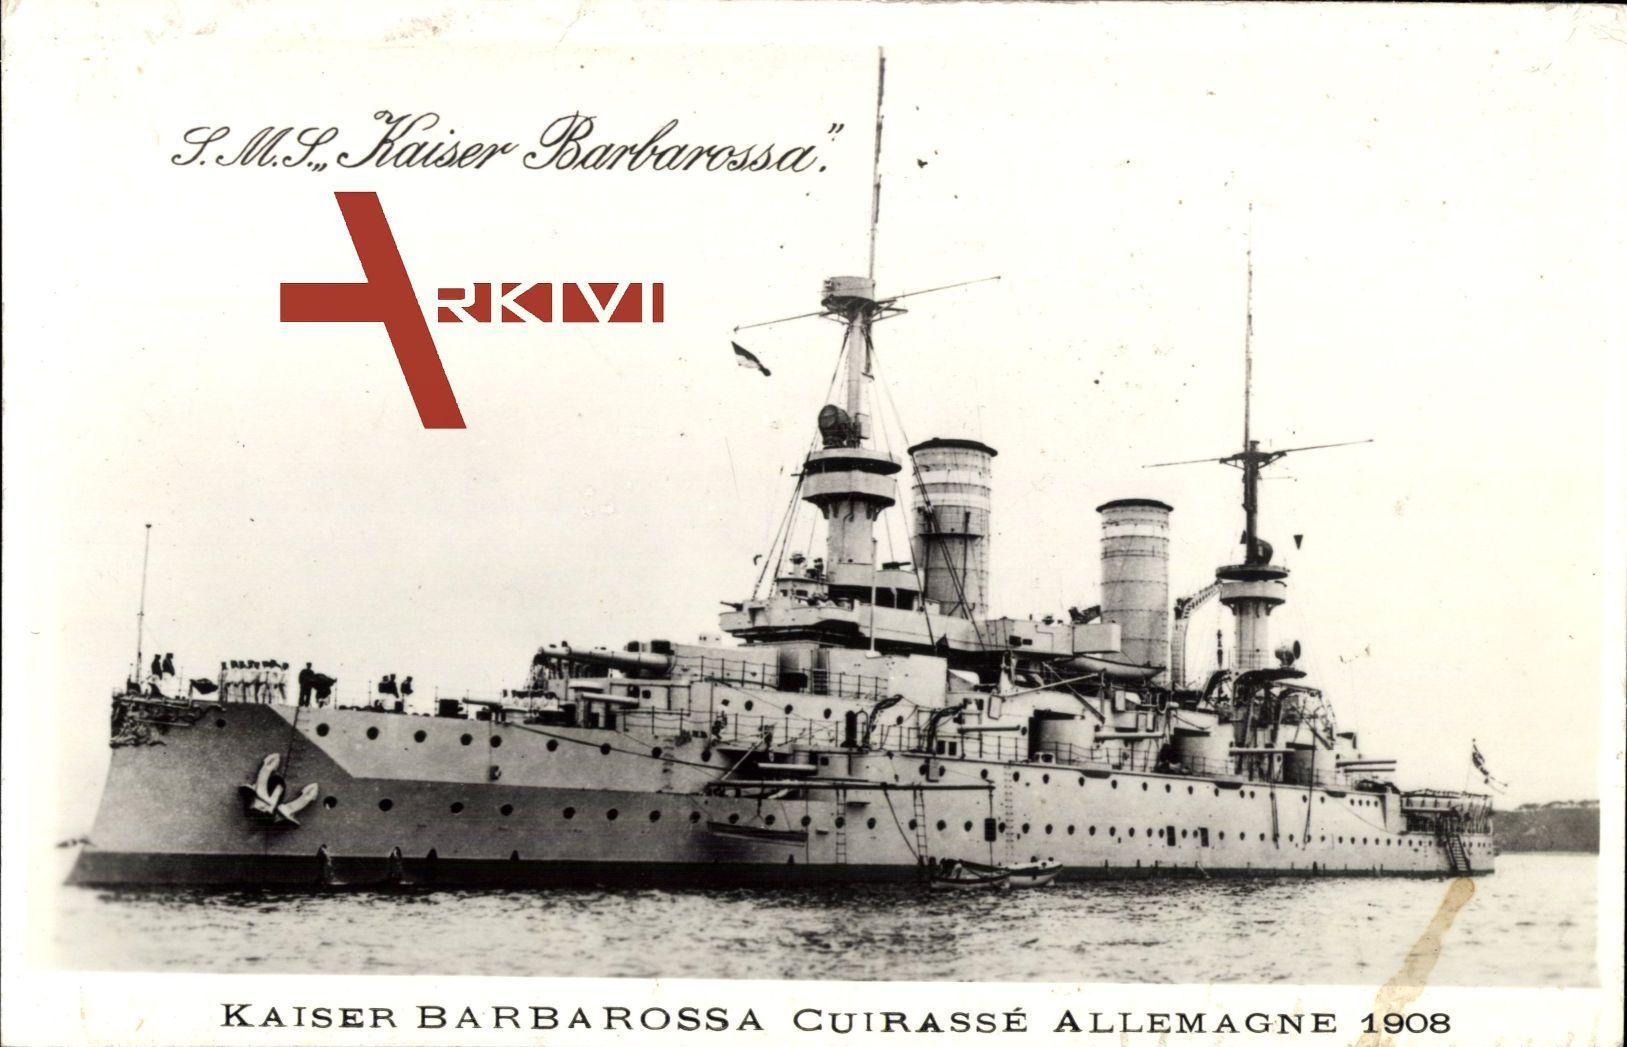 Kriegsschiff S.M.S. Kaiser Barbarossa, Cuirassée Allemagne 1908